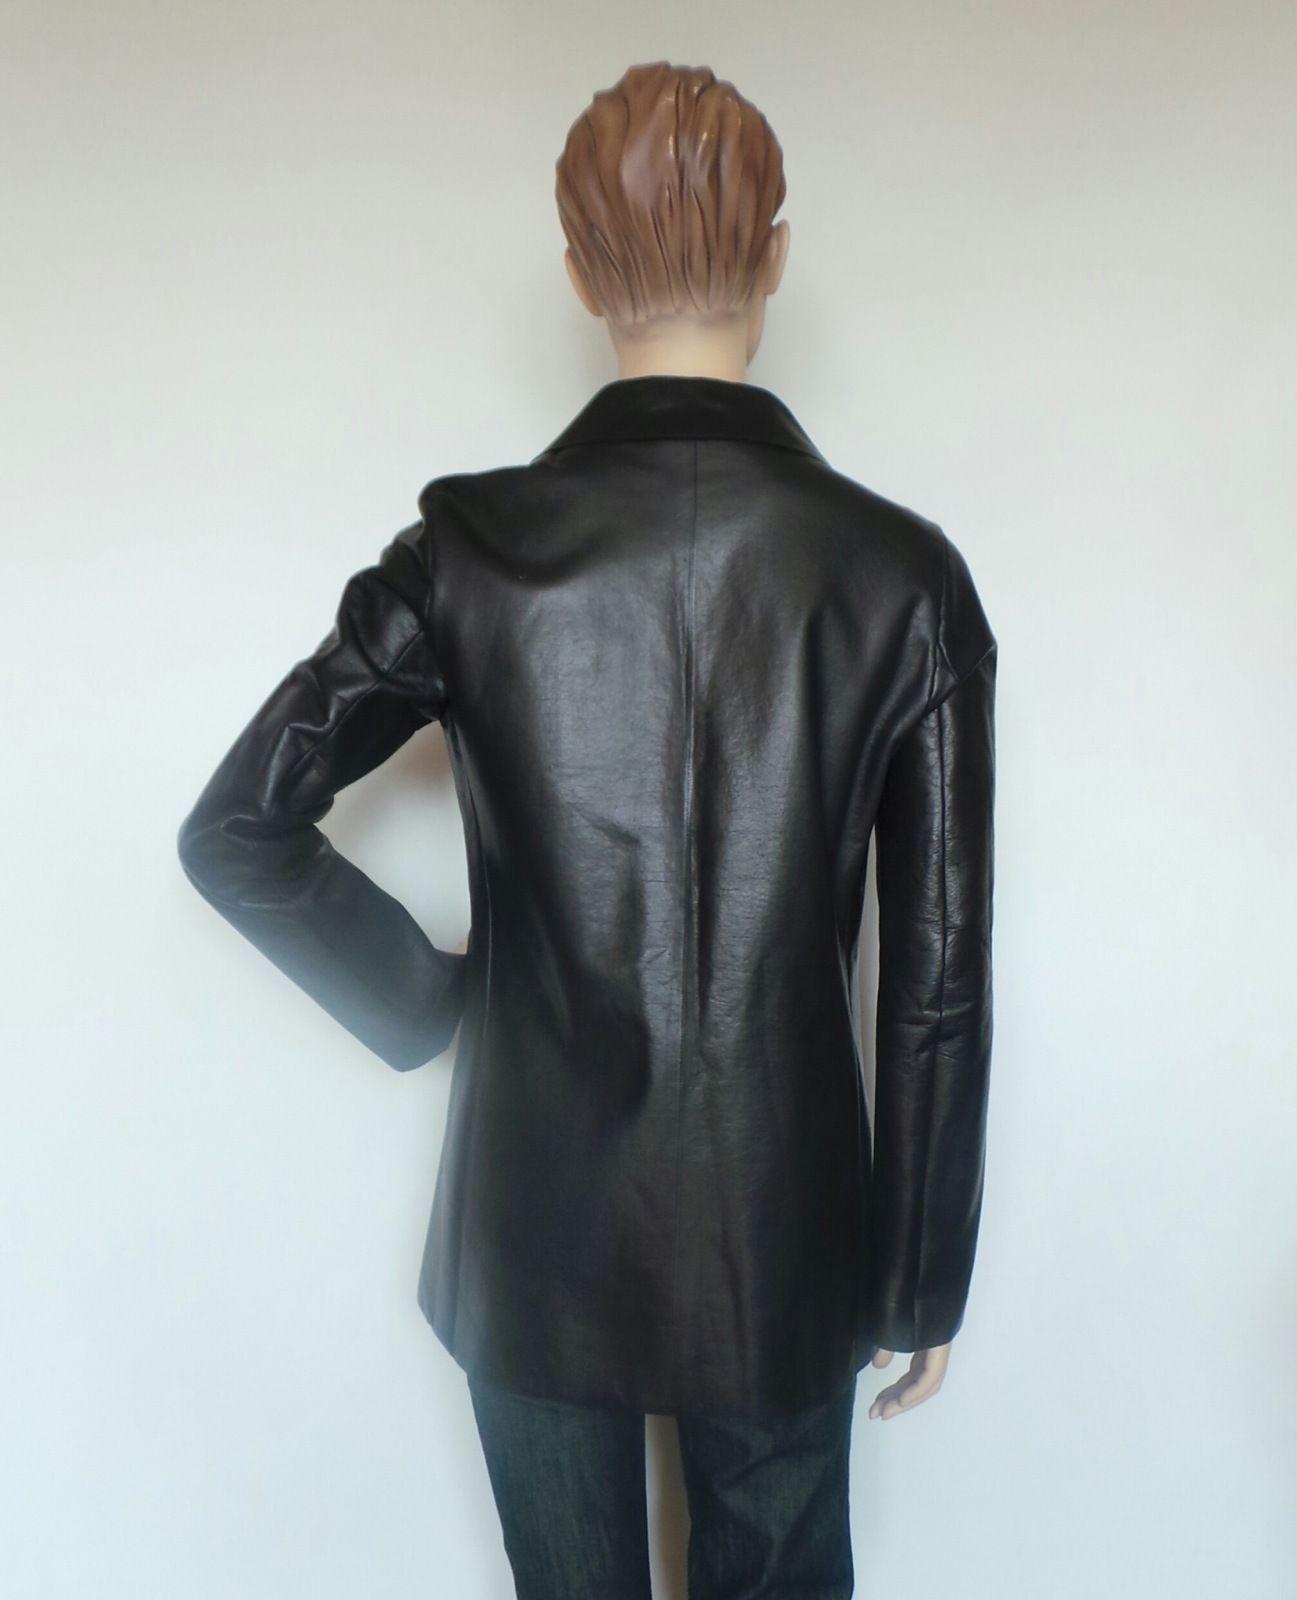 Jil Sander Women 039 s Leather Pea Coat Jacket Made in Italy Size 4   eBay